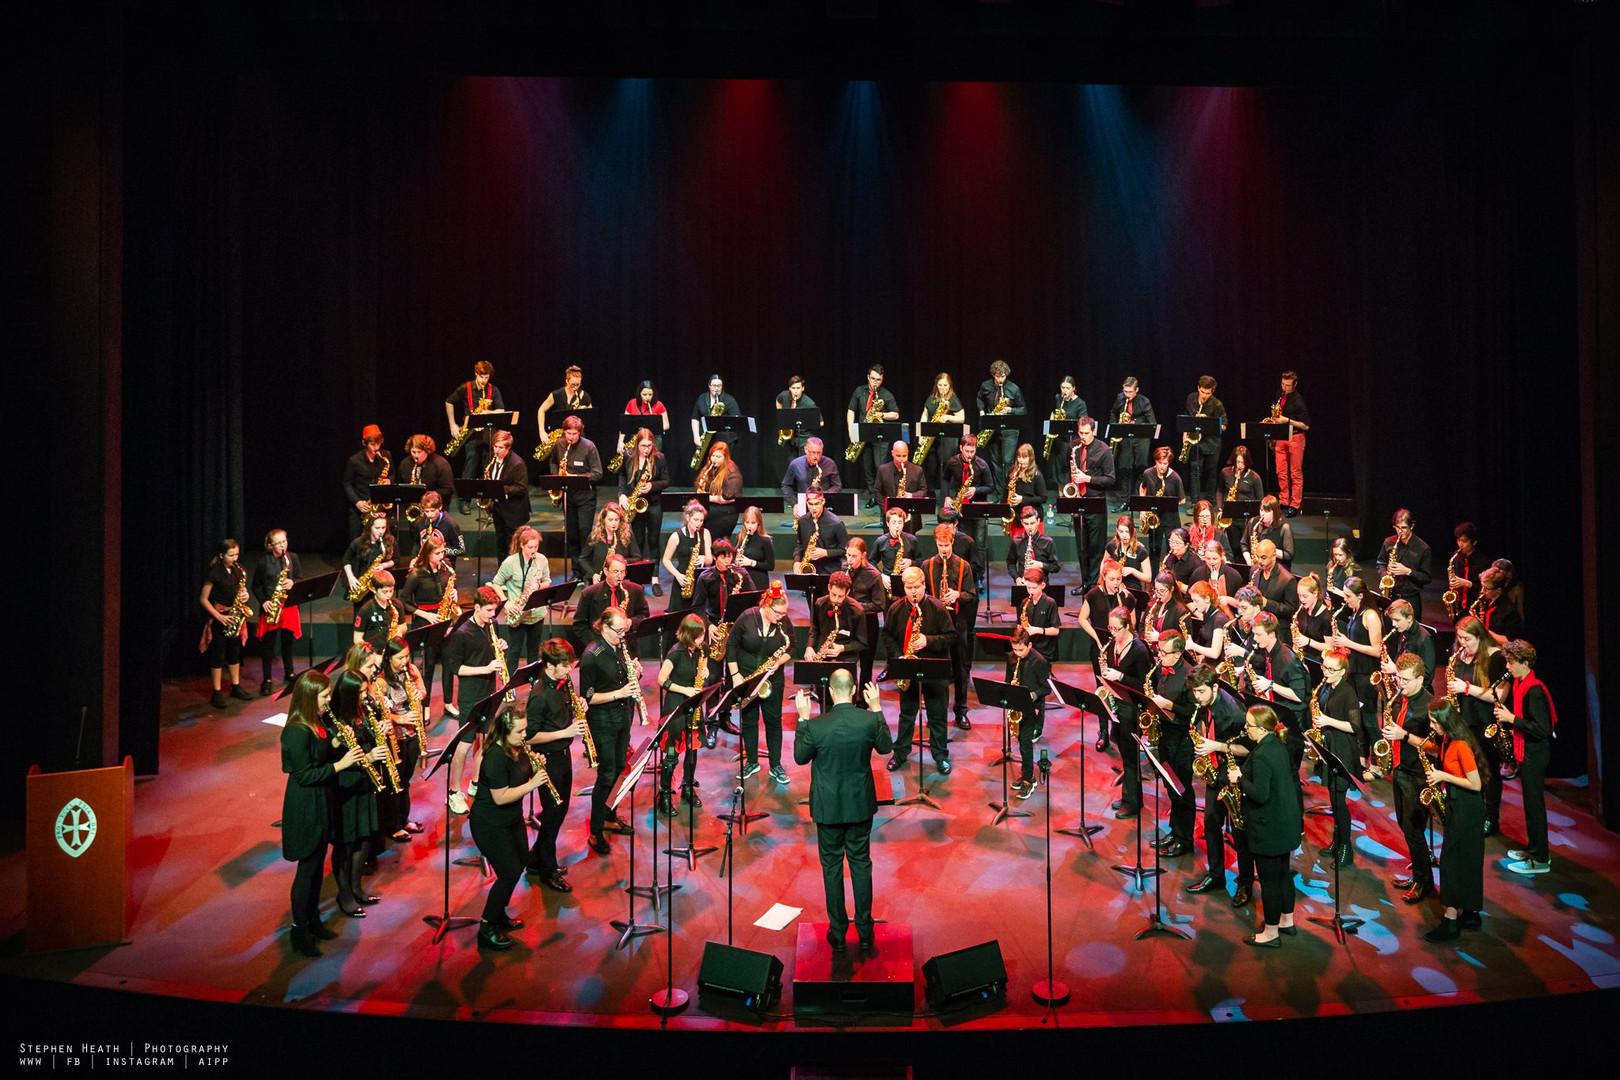 Massed Sax Orchestra